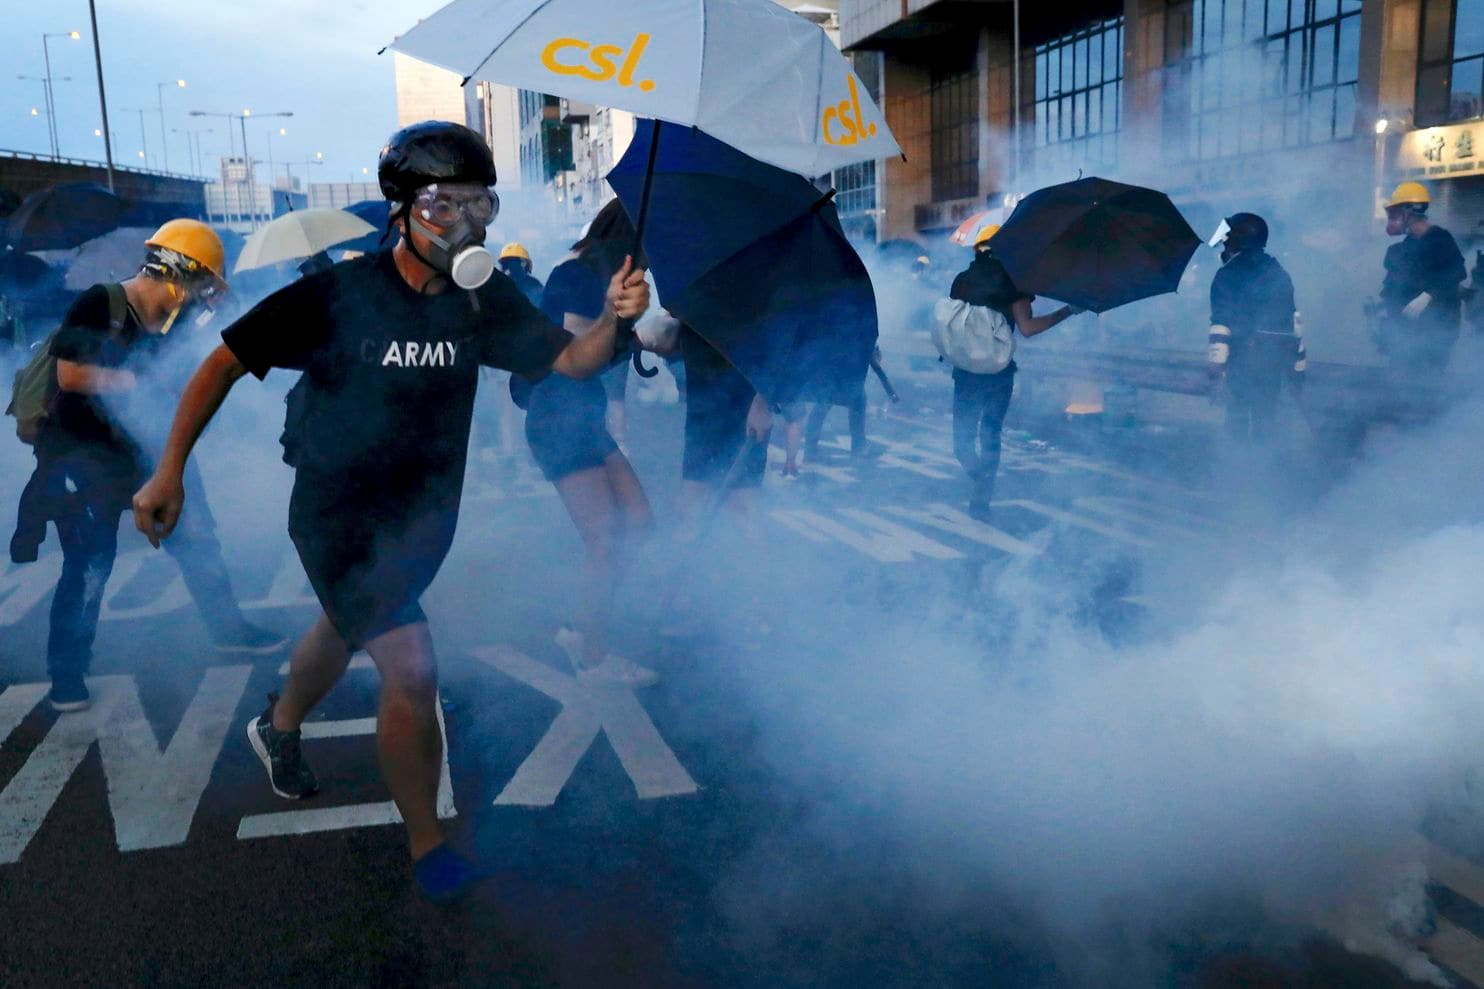 Will Hong Kong's Carrie Lam resign?